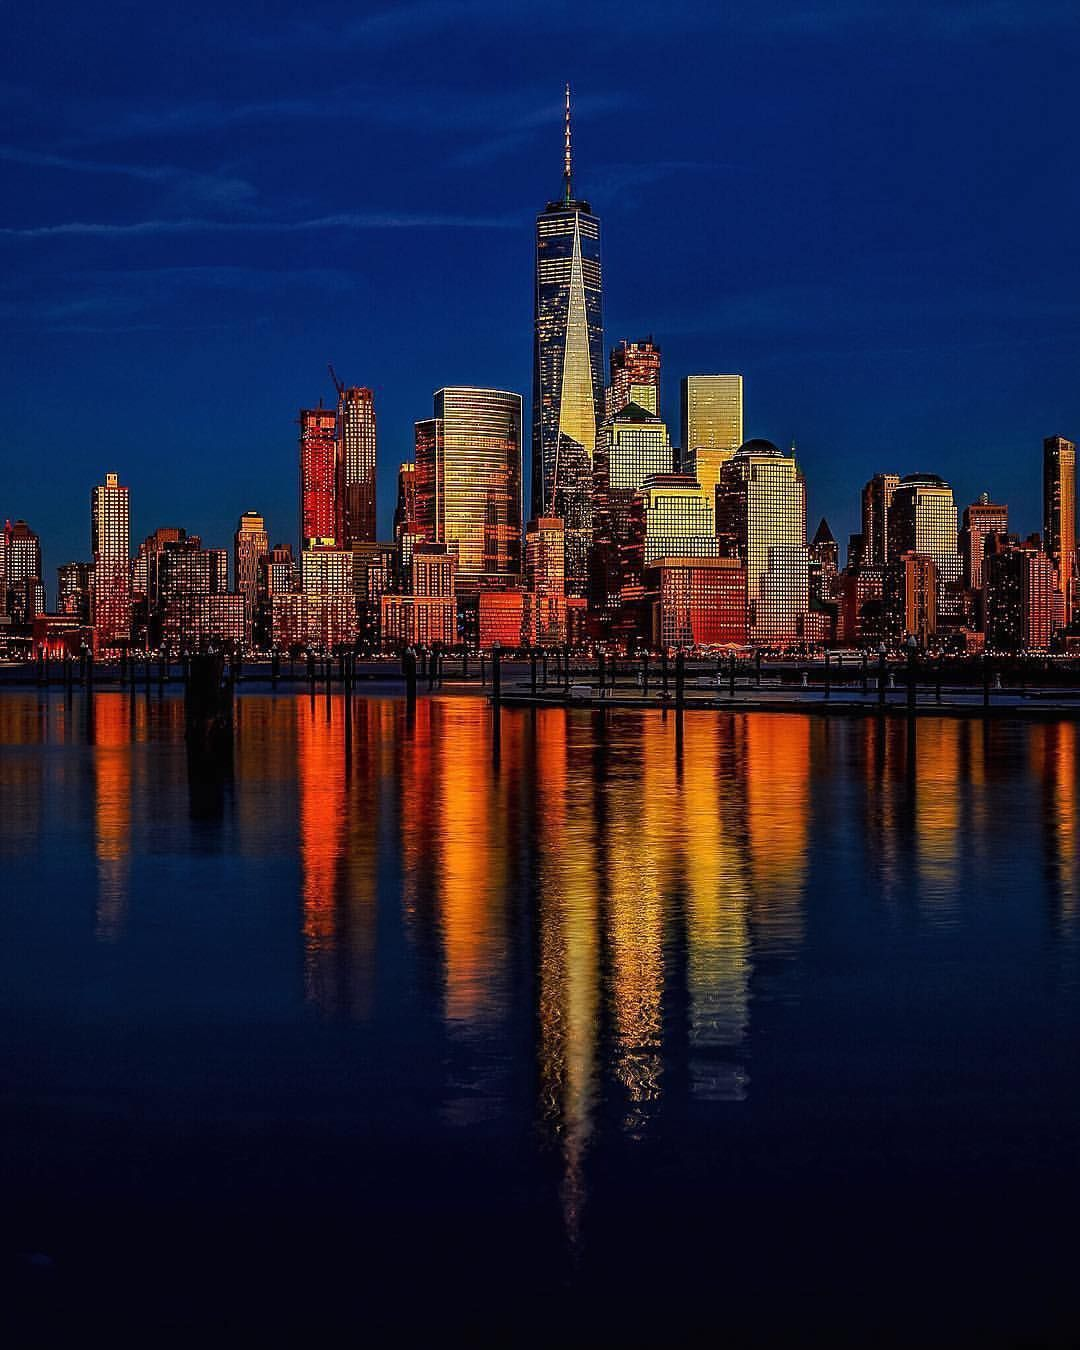 Newyork Newyorkcity Ilovenewyork Photography Manhattan Oneworldtradecenter Architecture City Landscape New York Photography New York Pictures